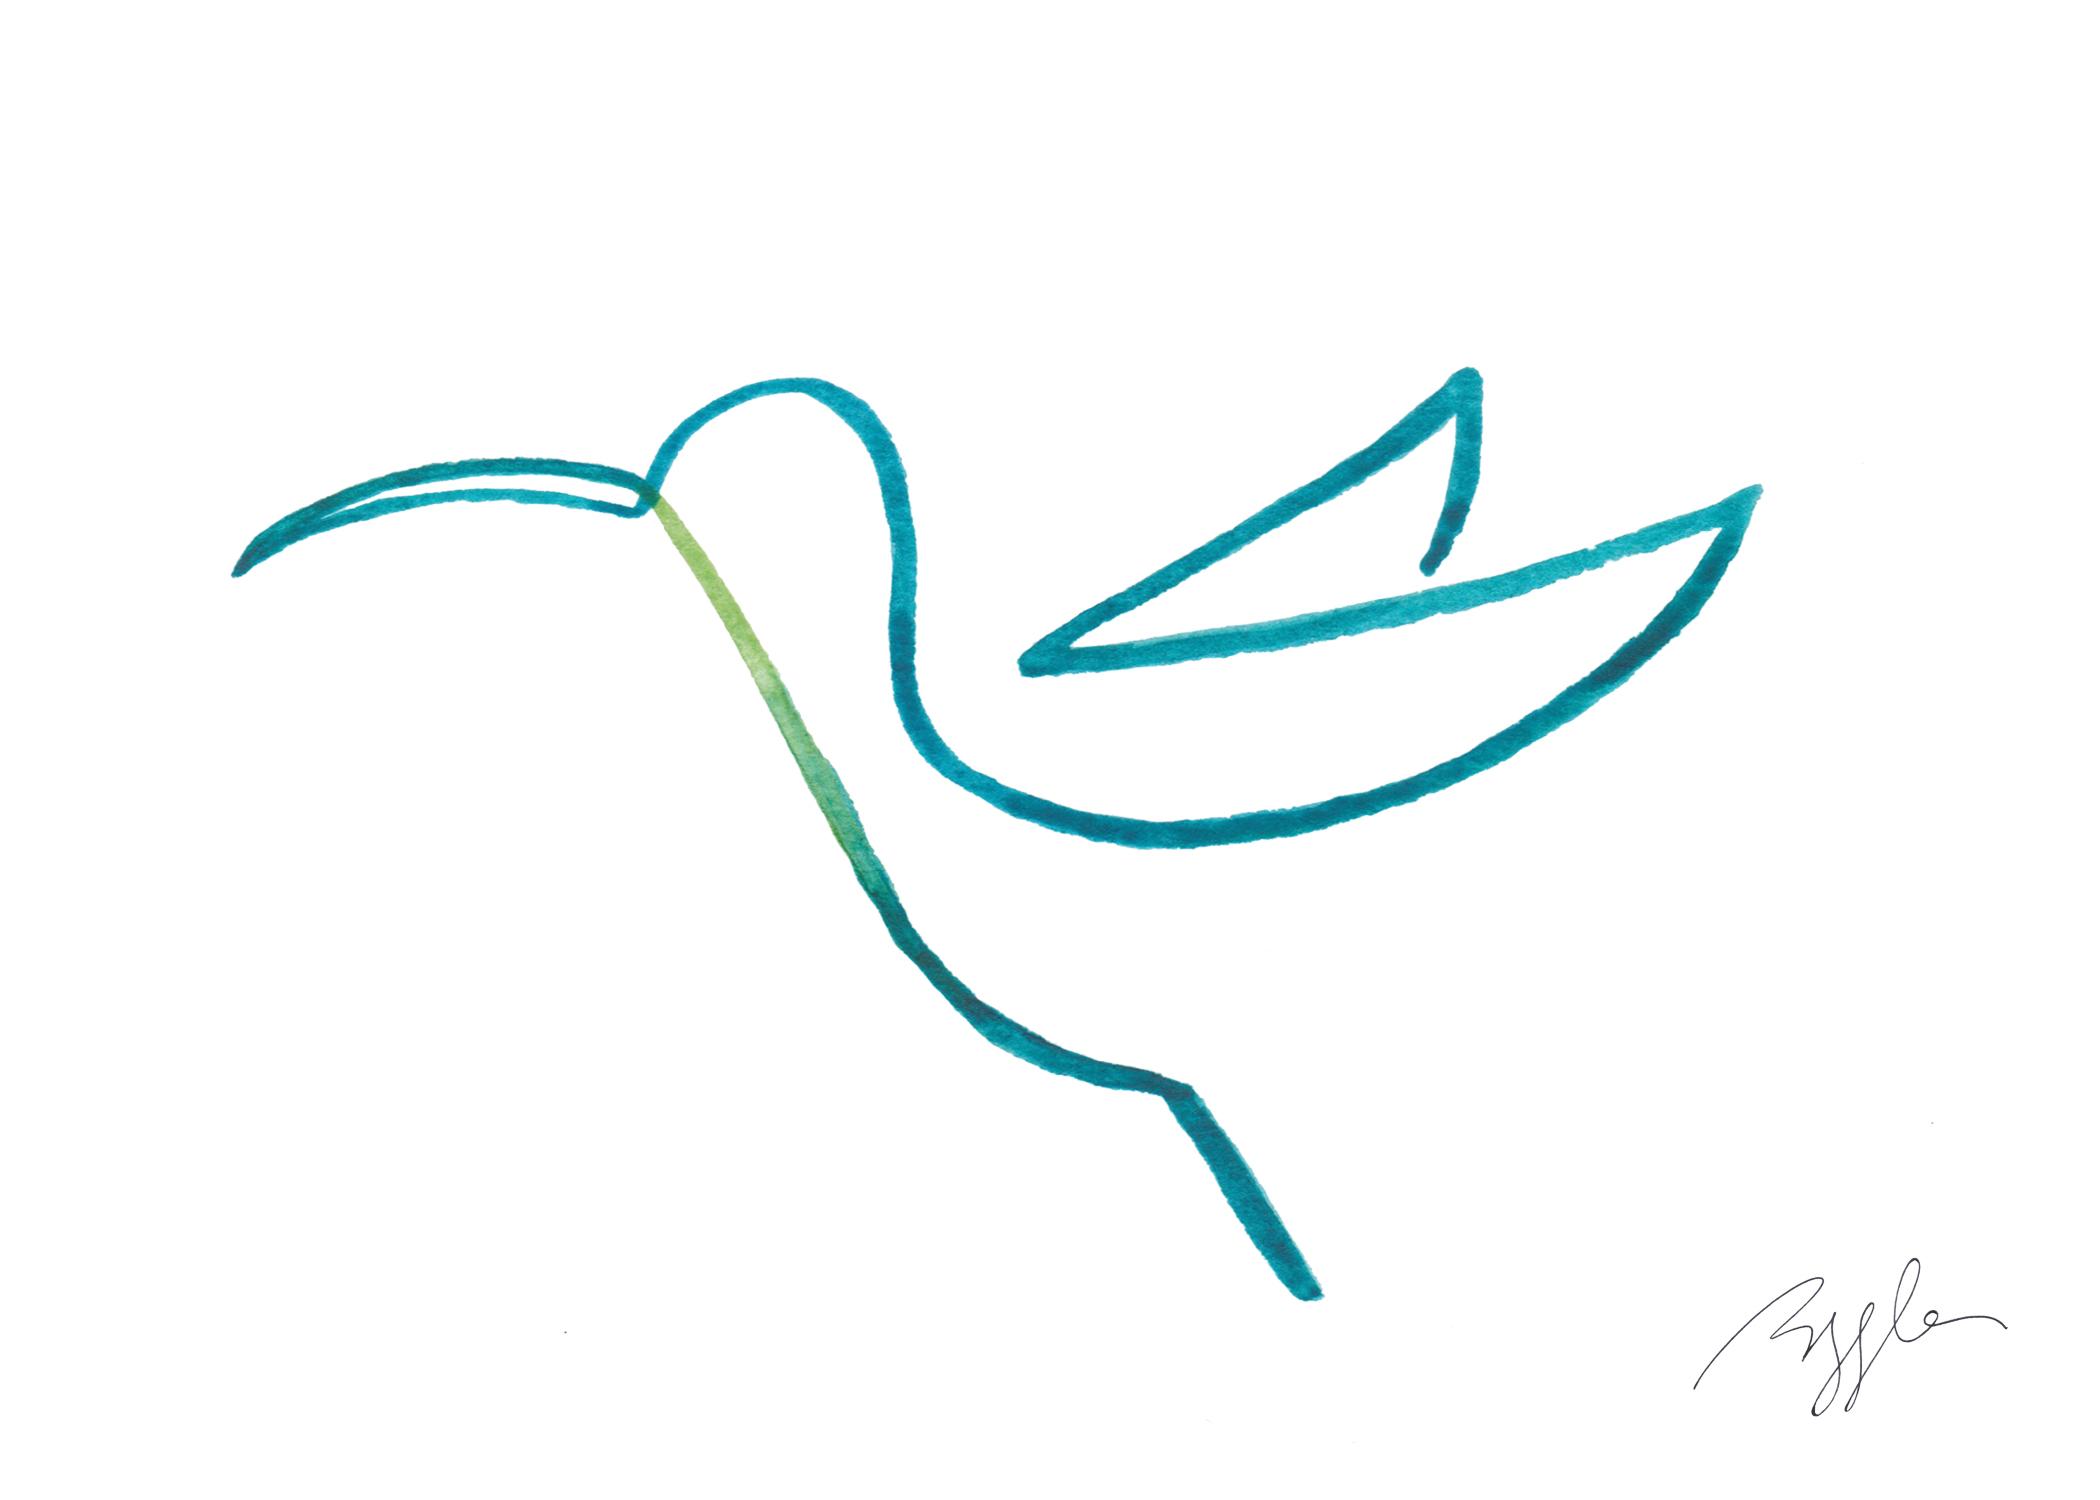 Brazzlebird - Blue Hummingbird Bird Line Watercolor Painting.jpg